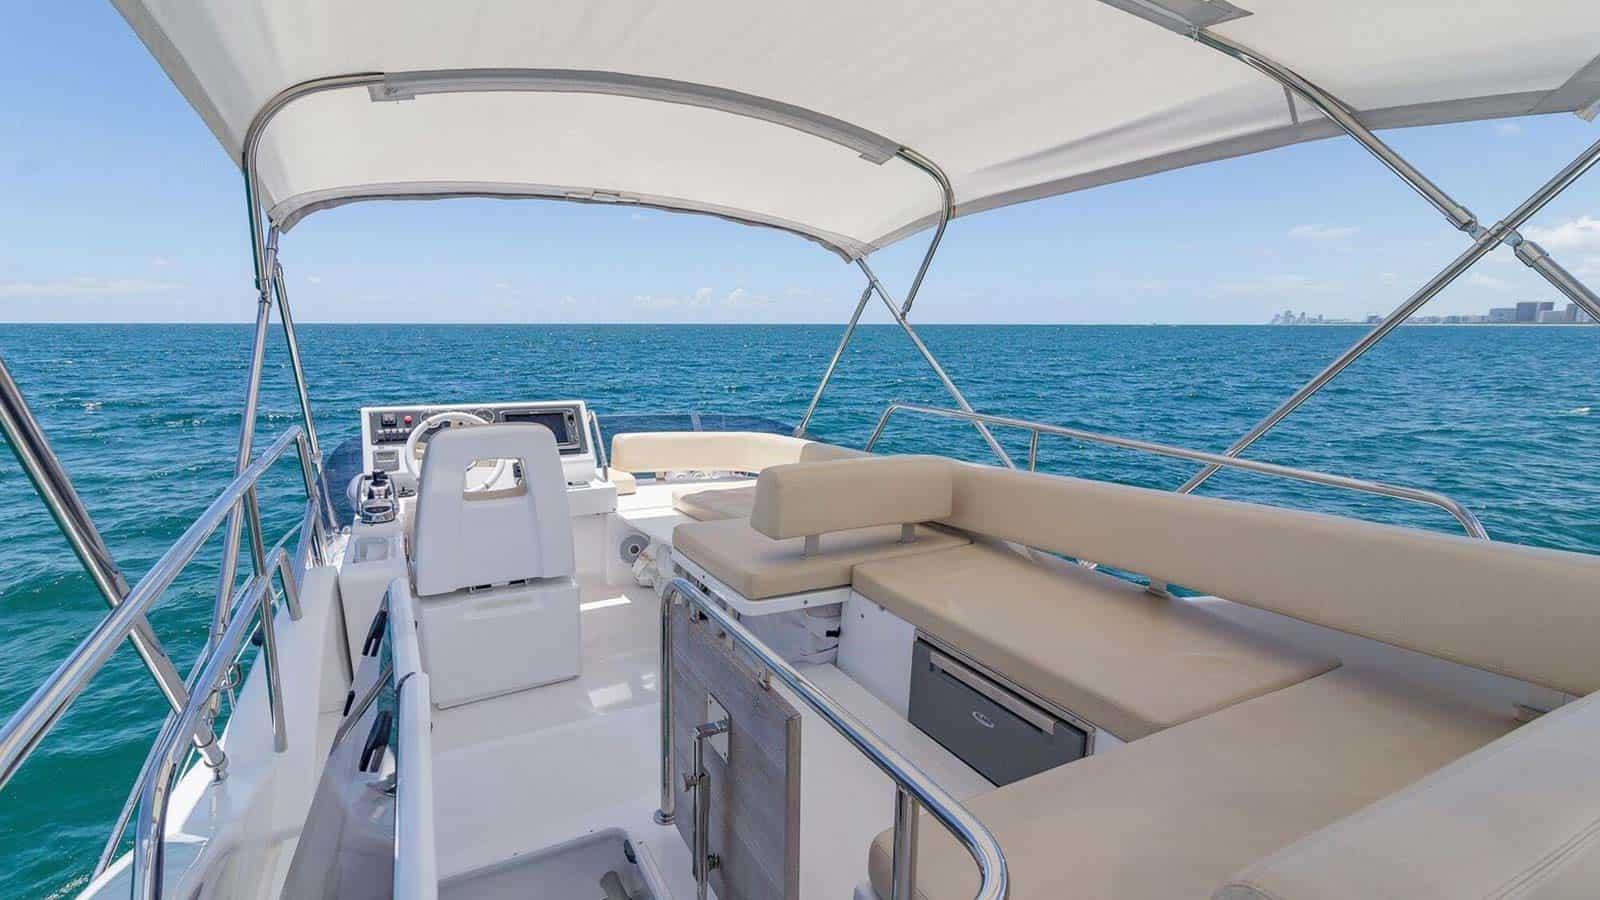 Miami Party Boat & Dance Cruise